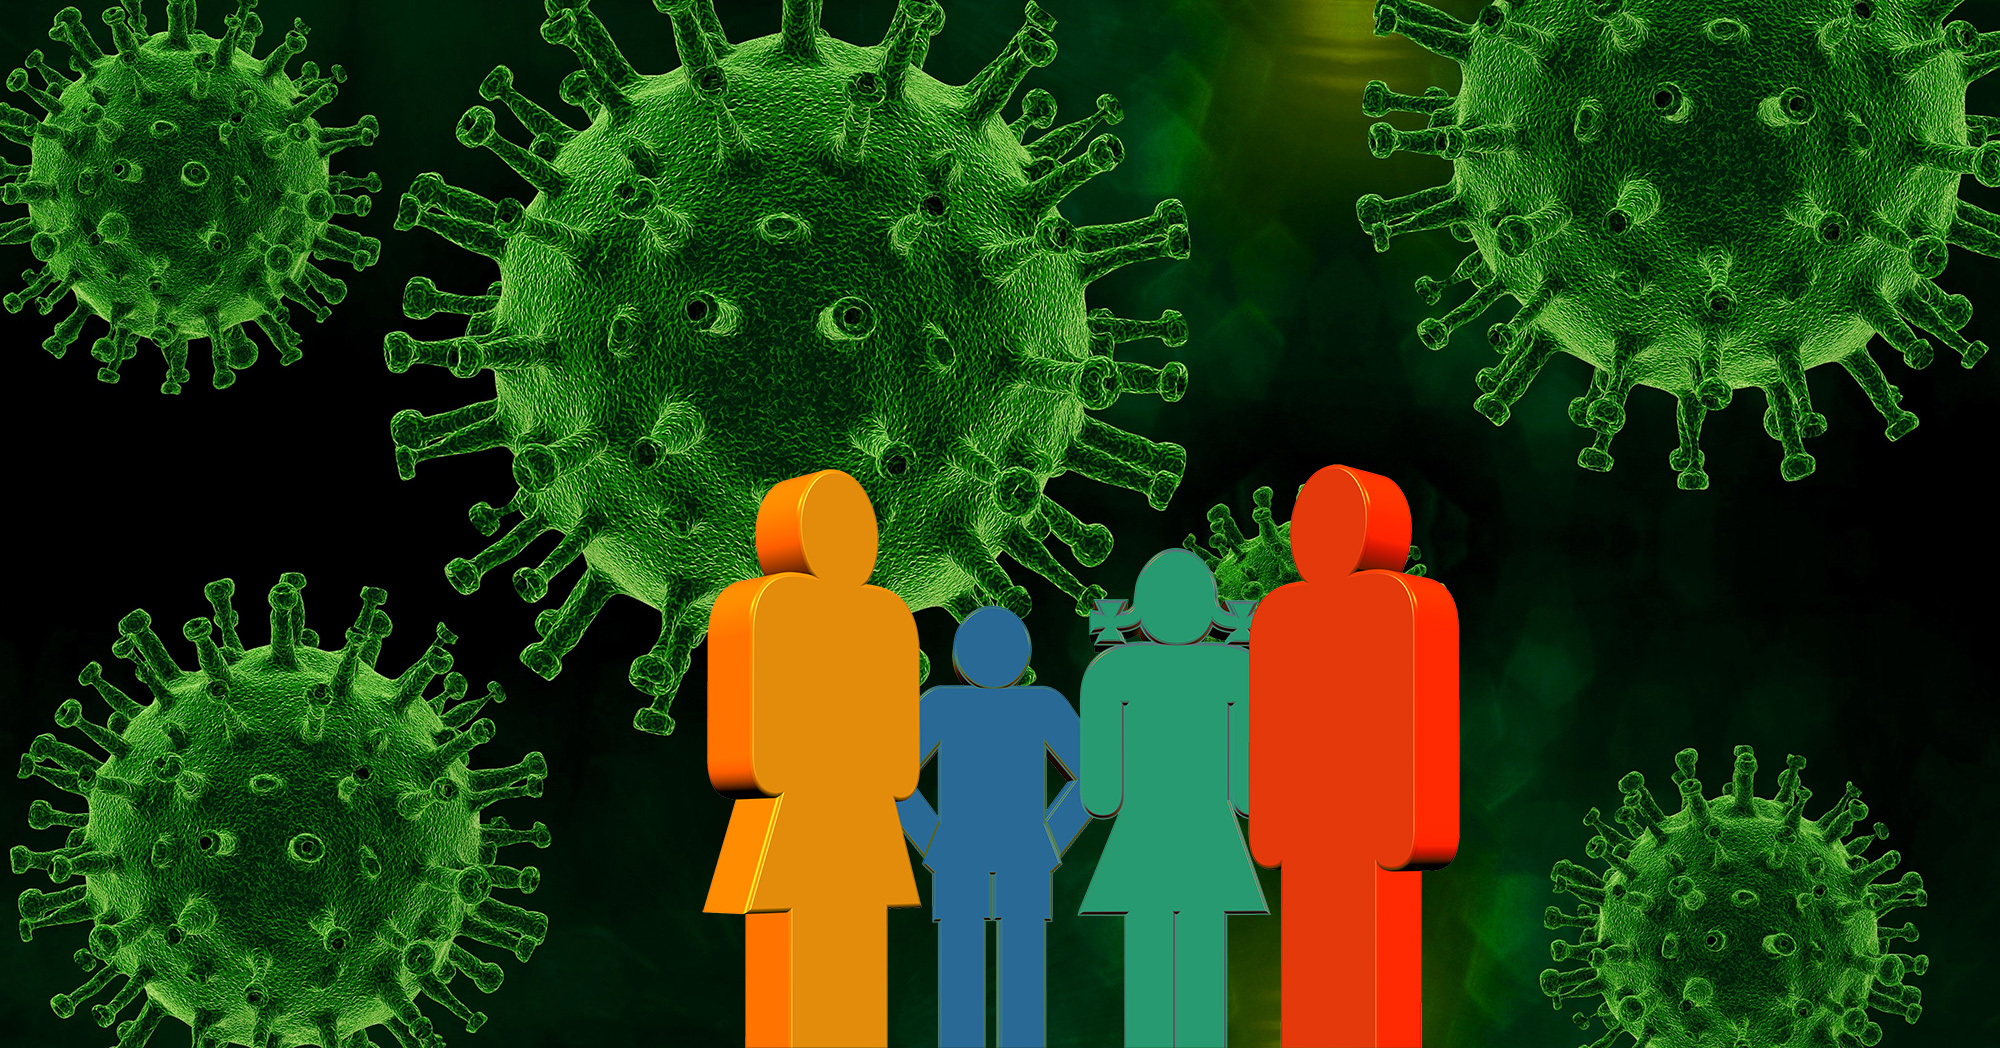 Aktuelle Informationen zur Entwicklung COVID-19 (Coronavirus SARS-CoV-2) – 1. Mai 2021